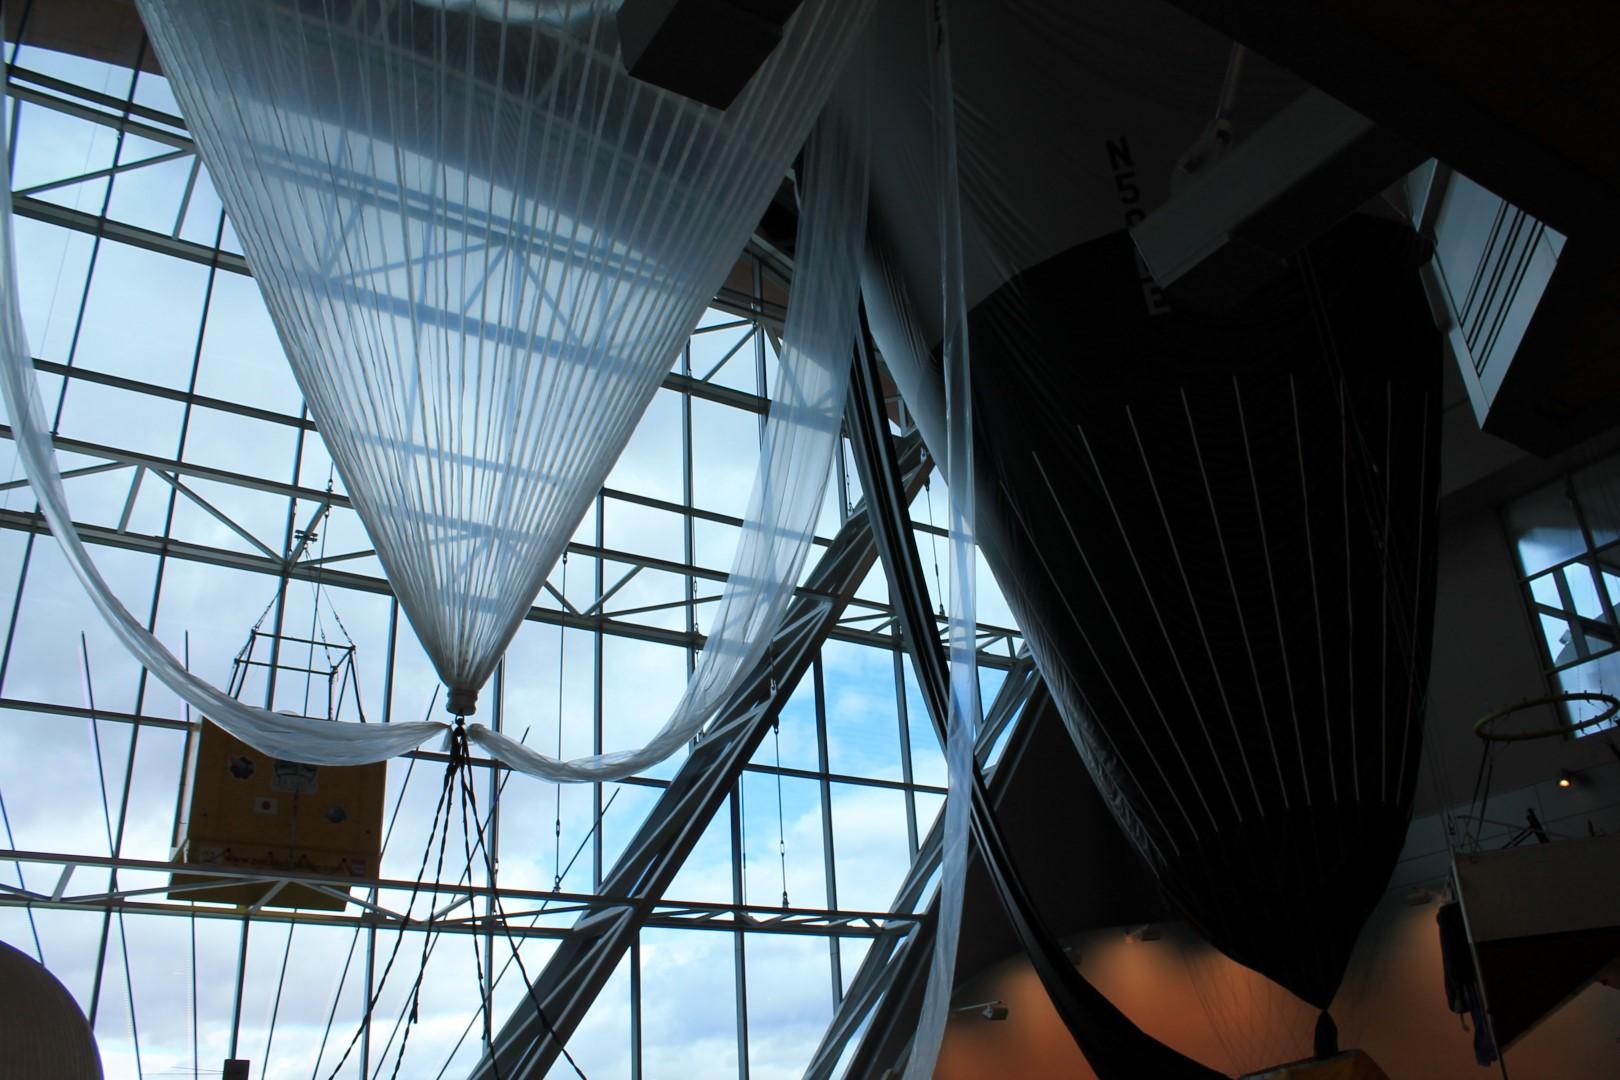 Baloon-Museum7.JPG